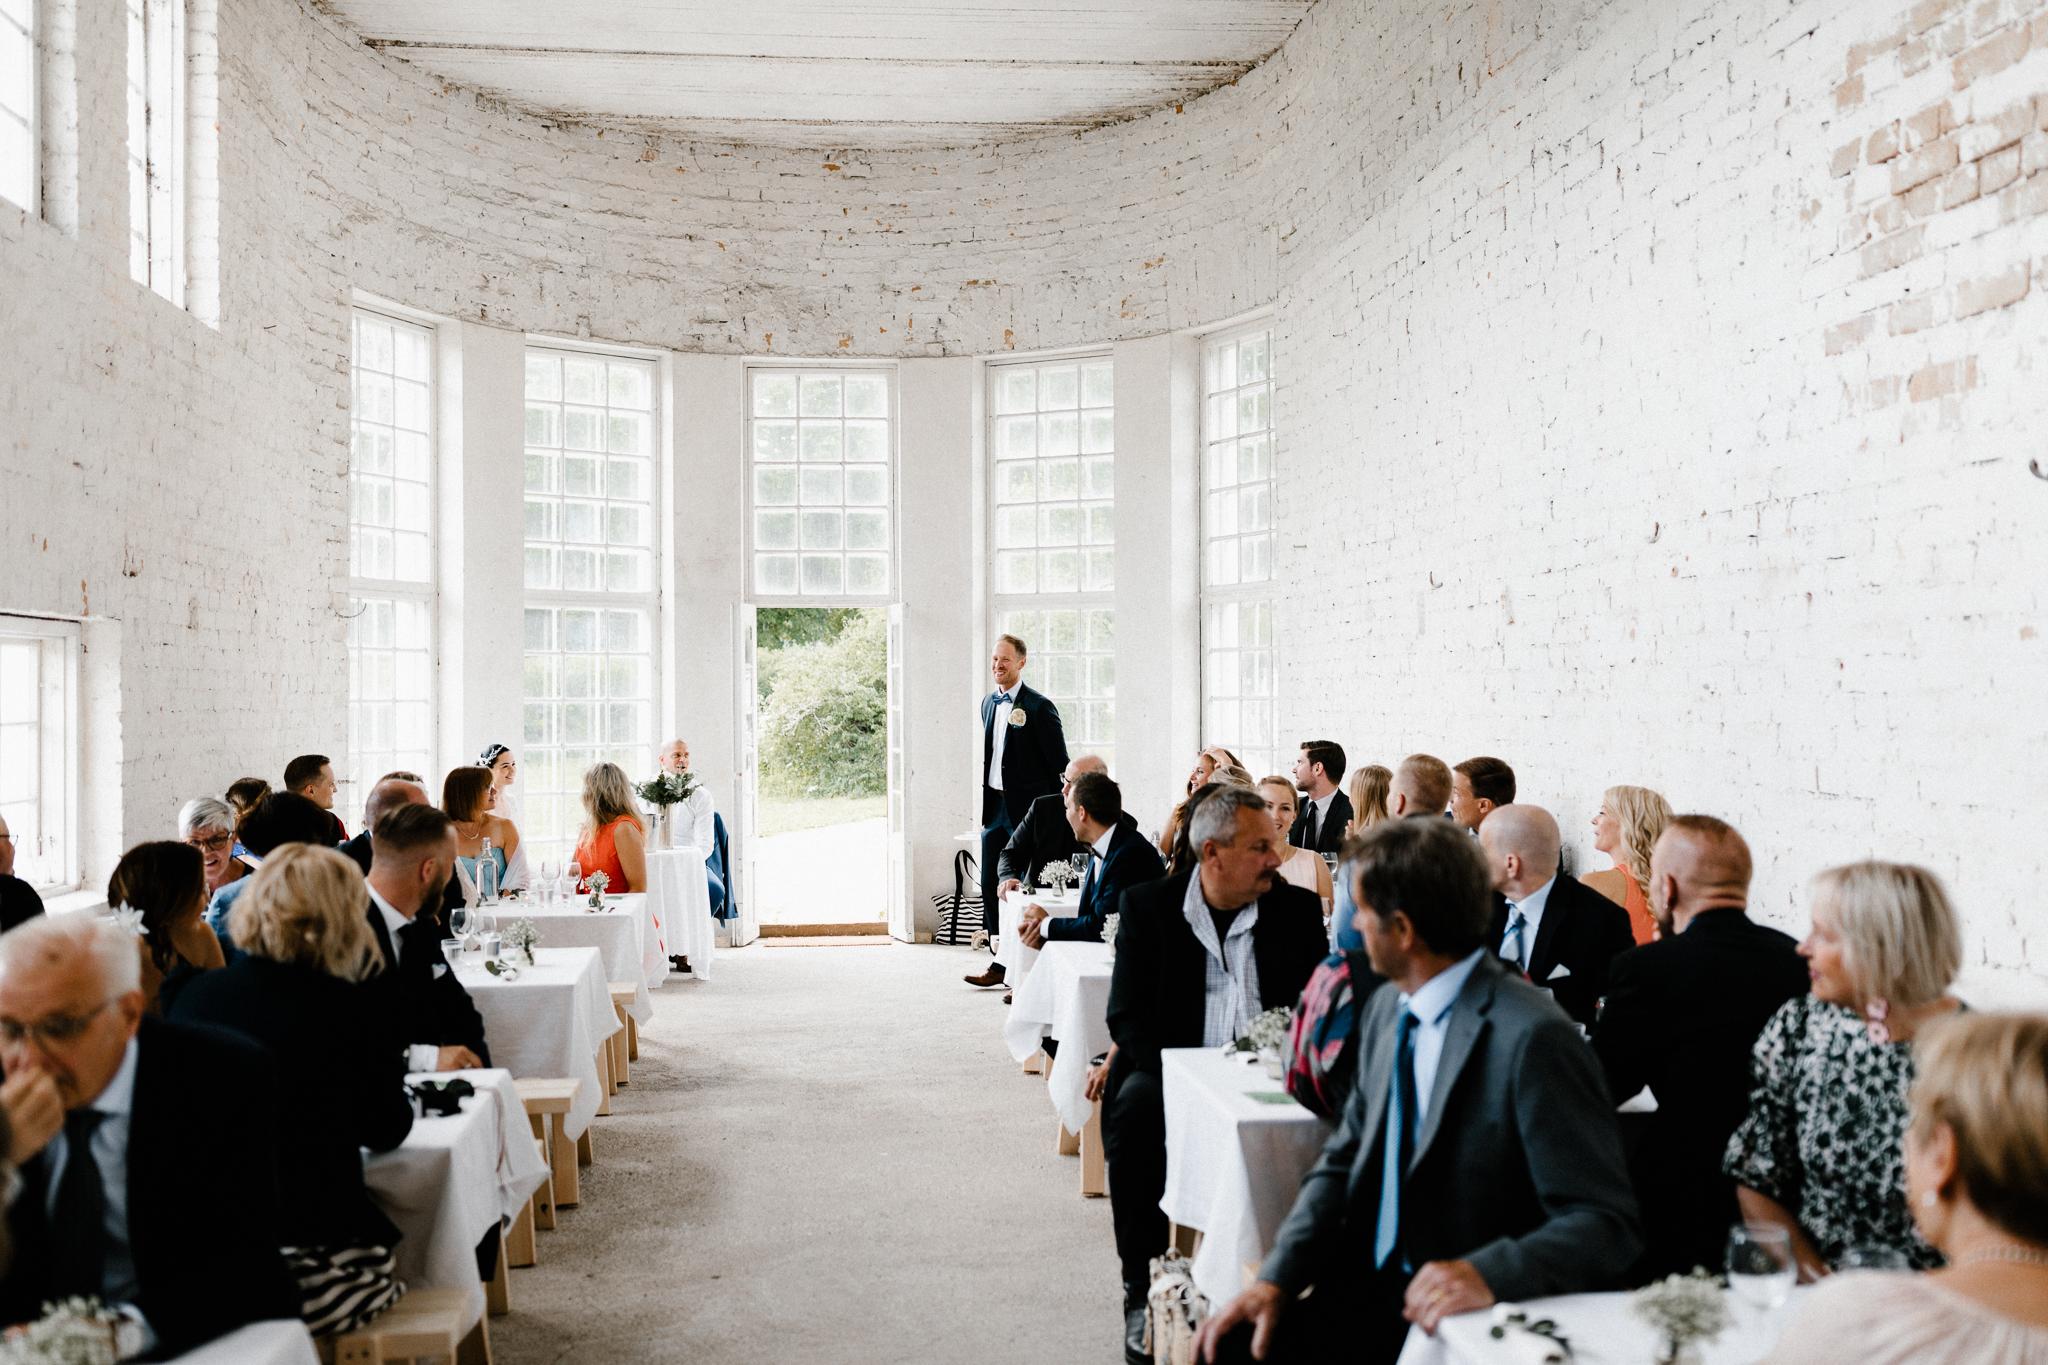 Essi + Ville   Oitbacka Gården   by Patrick Karkkolainen Wedding Photography-211.jpg